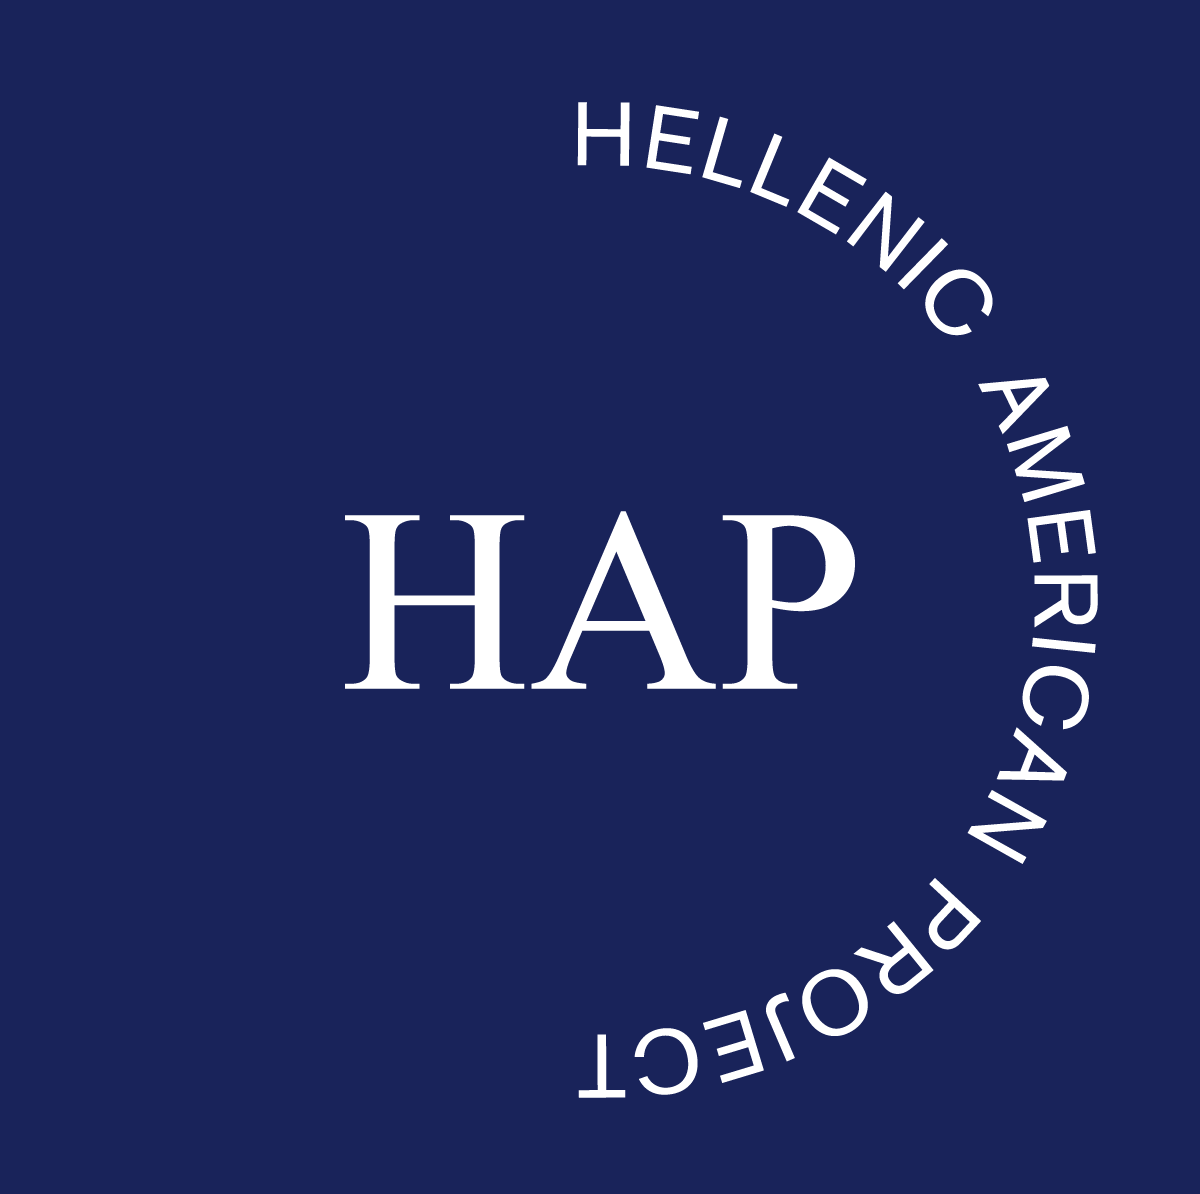 Hellenic-American Project